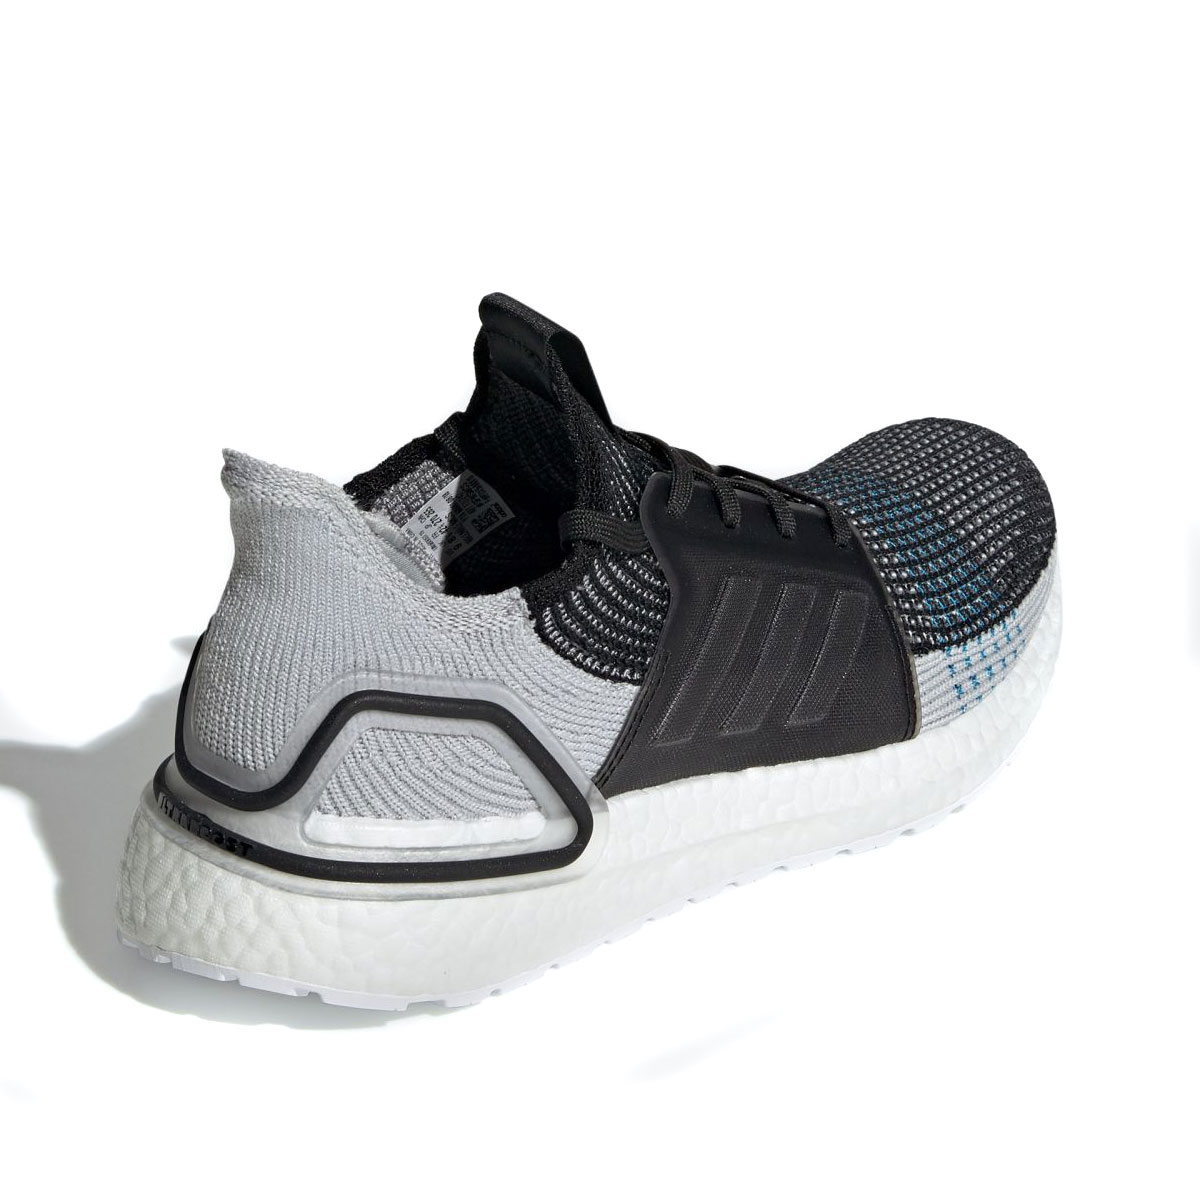 c19bf5df3172e adidas UltraBOOST 19 (CORE BLACK GREY SIX SHOCK CYAN) (Adidas ultra boost 19 )